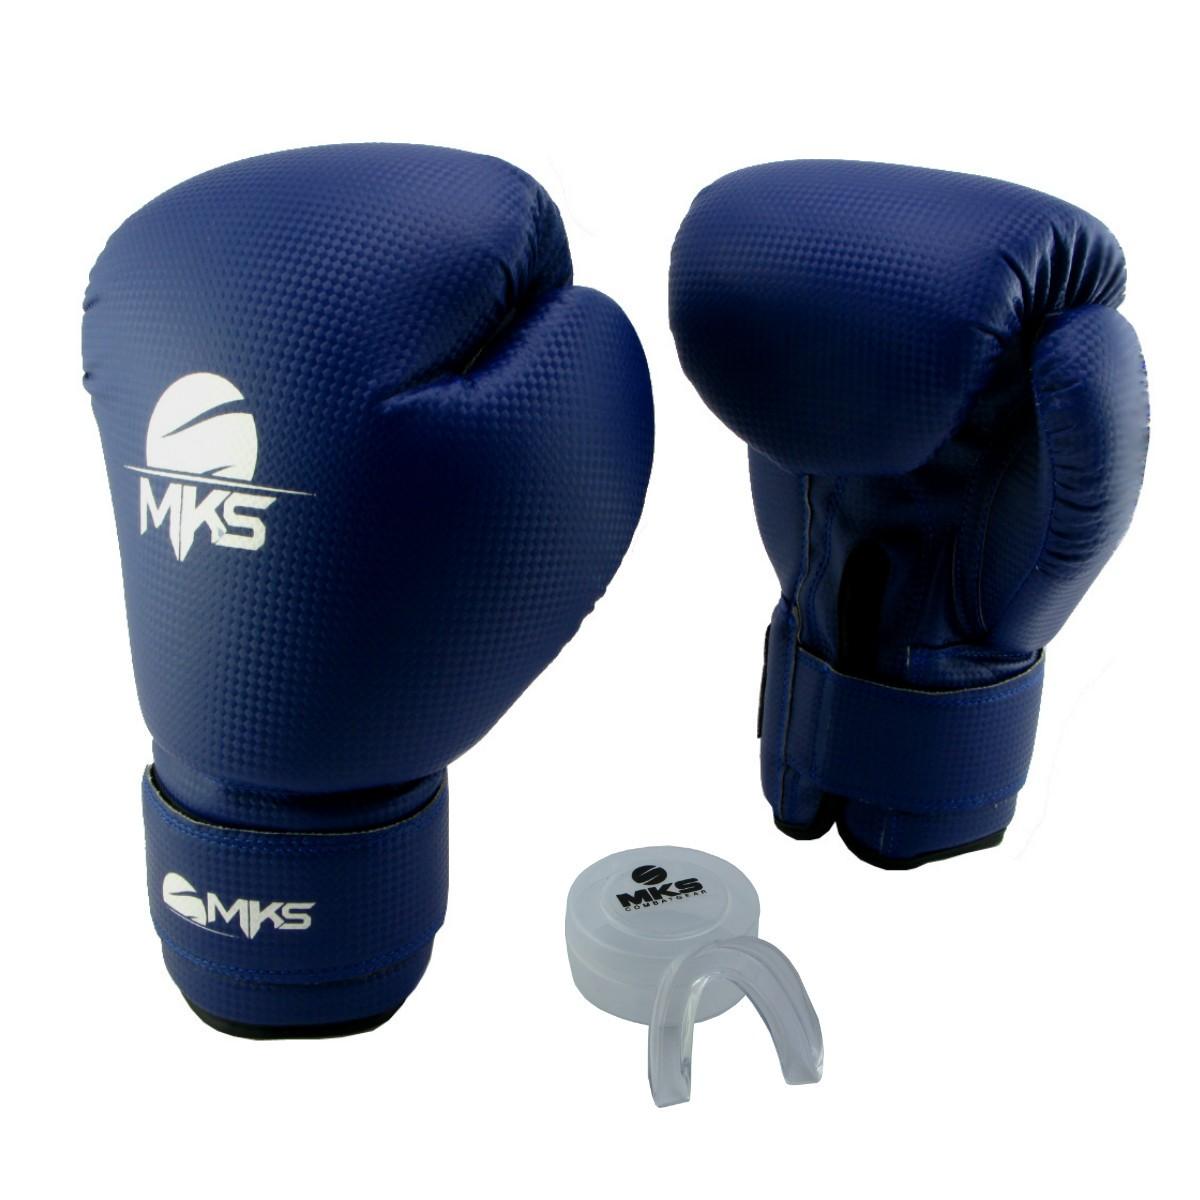 Luva de Boxe Prospect MKS Blue 16 oz + Protetor Bucal